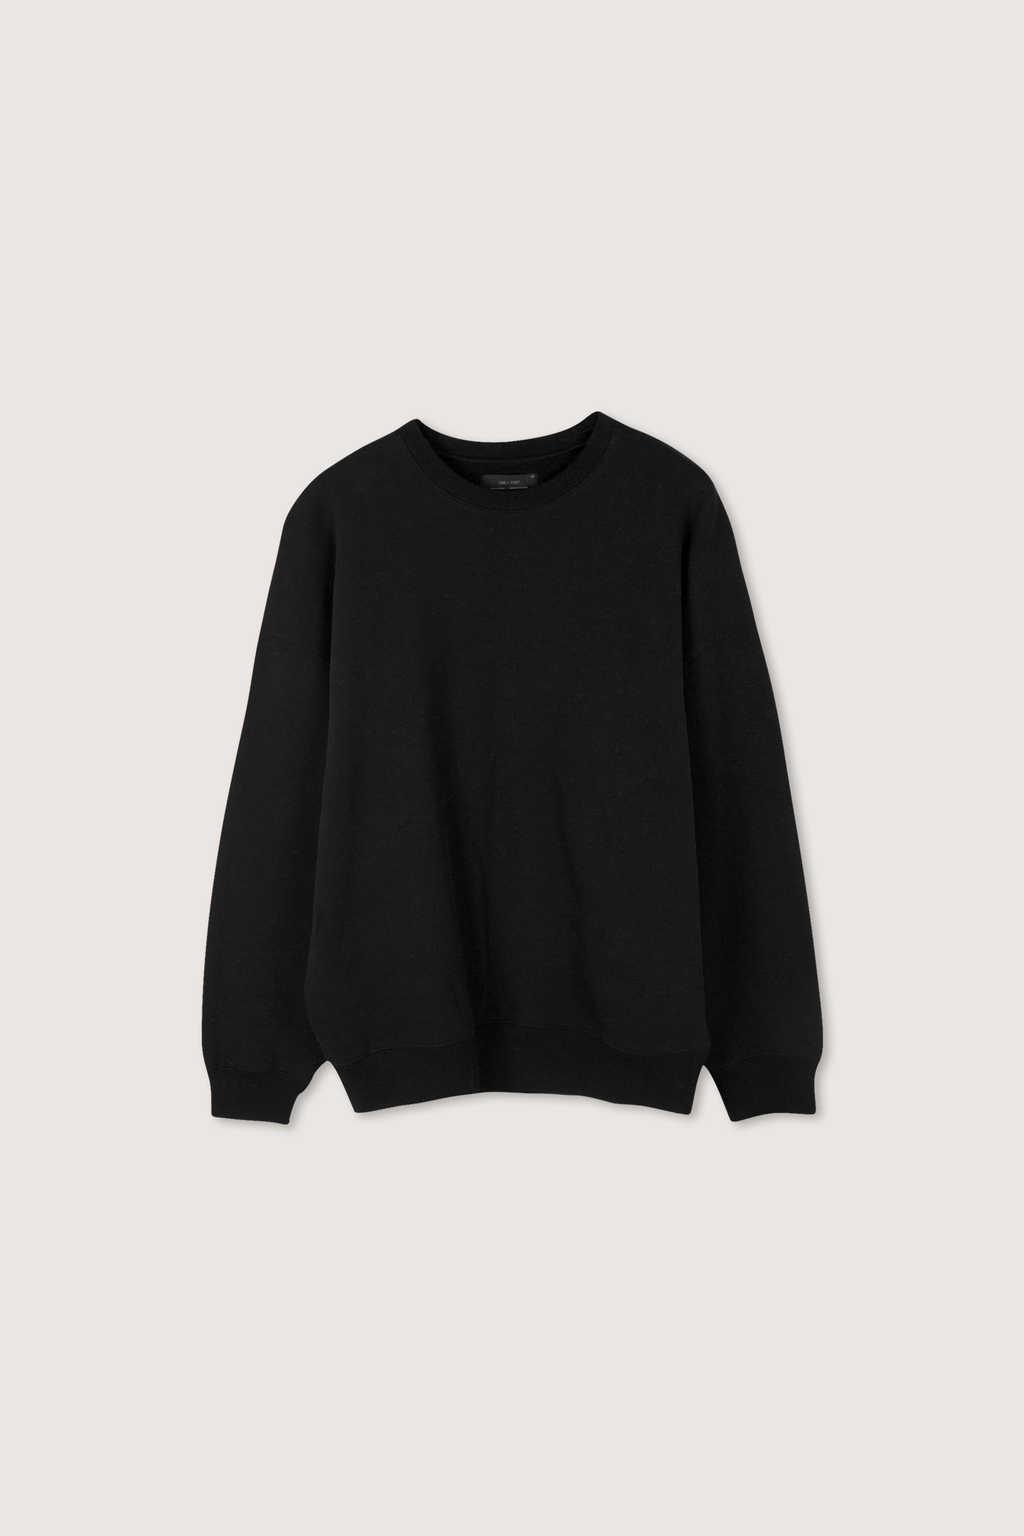 Sweatshirt 1762 Black 5